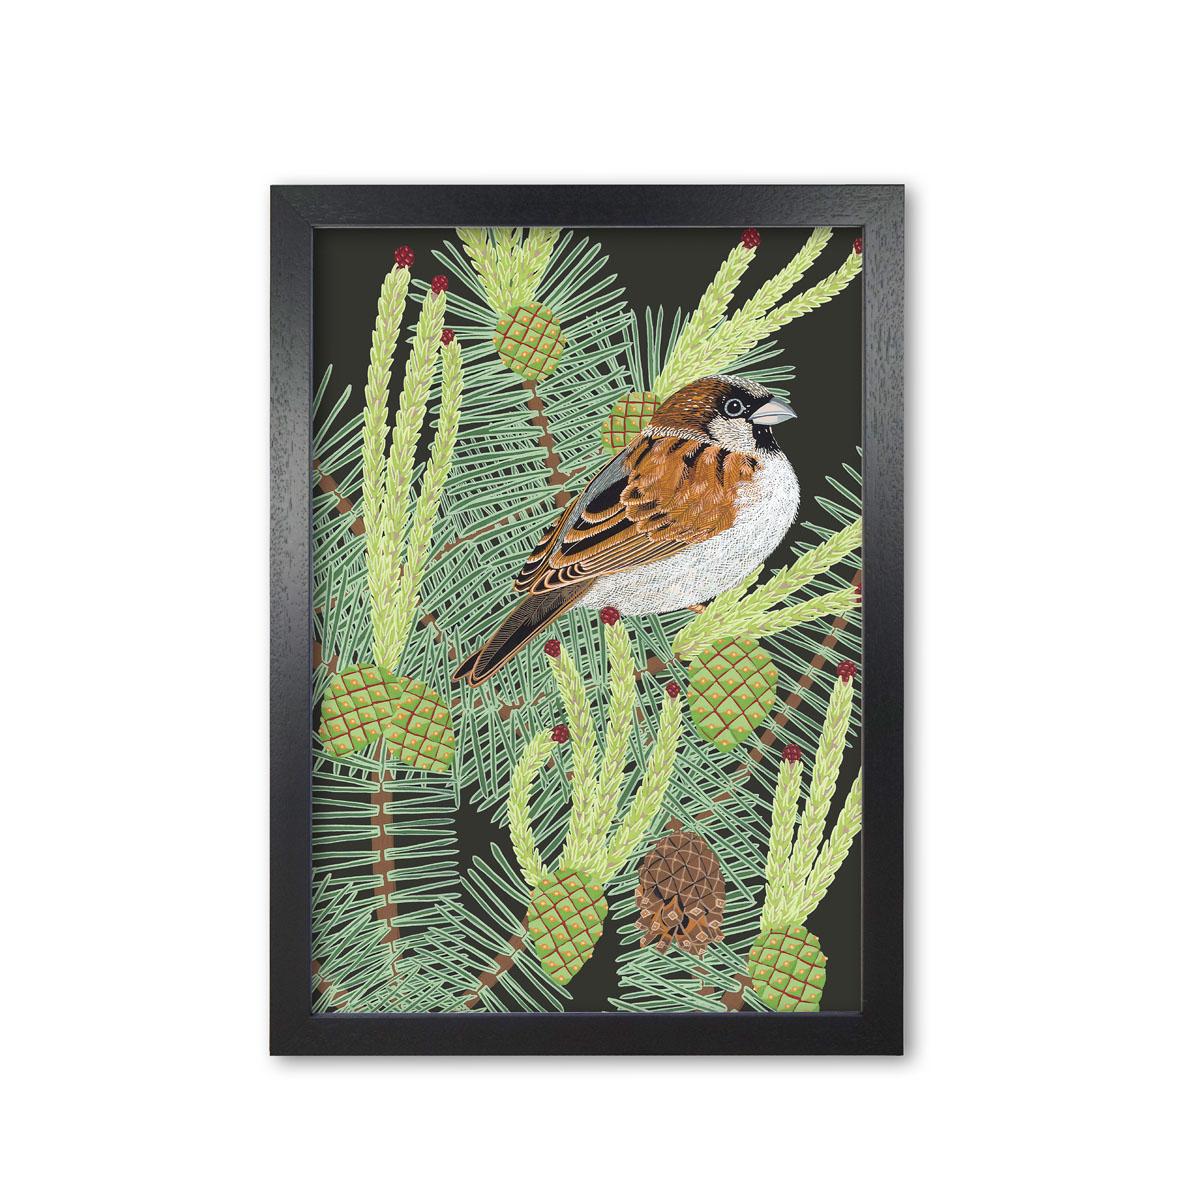 Sparrow Garden Bird Mounted And Framed Print